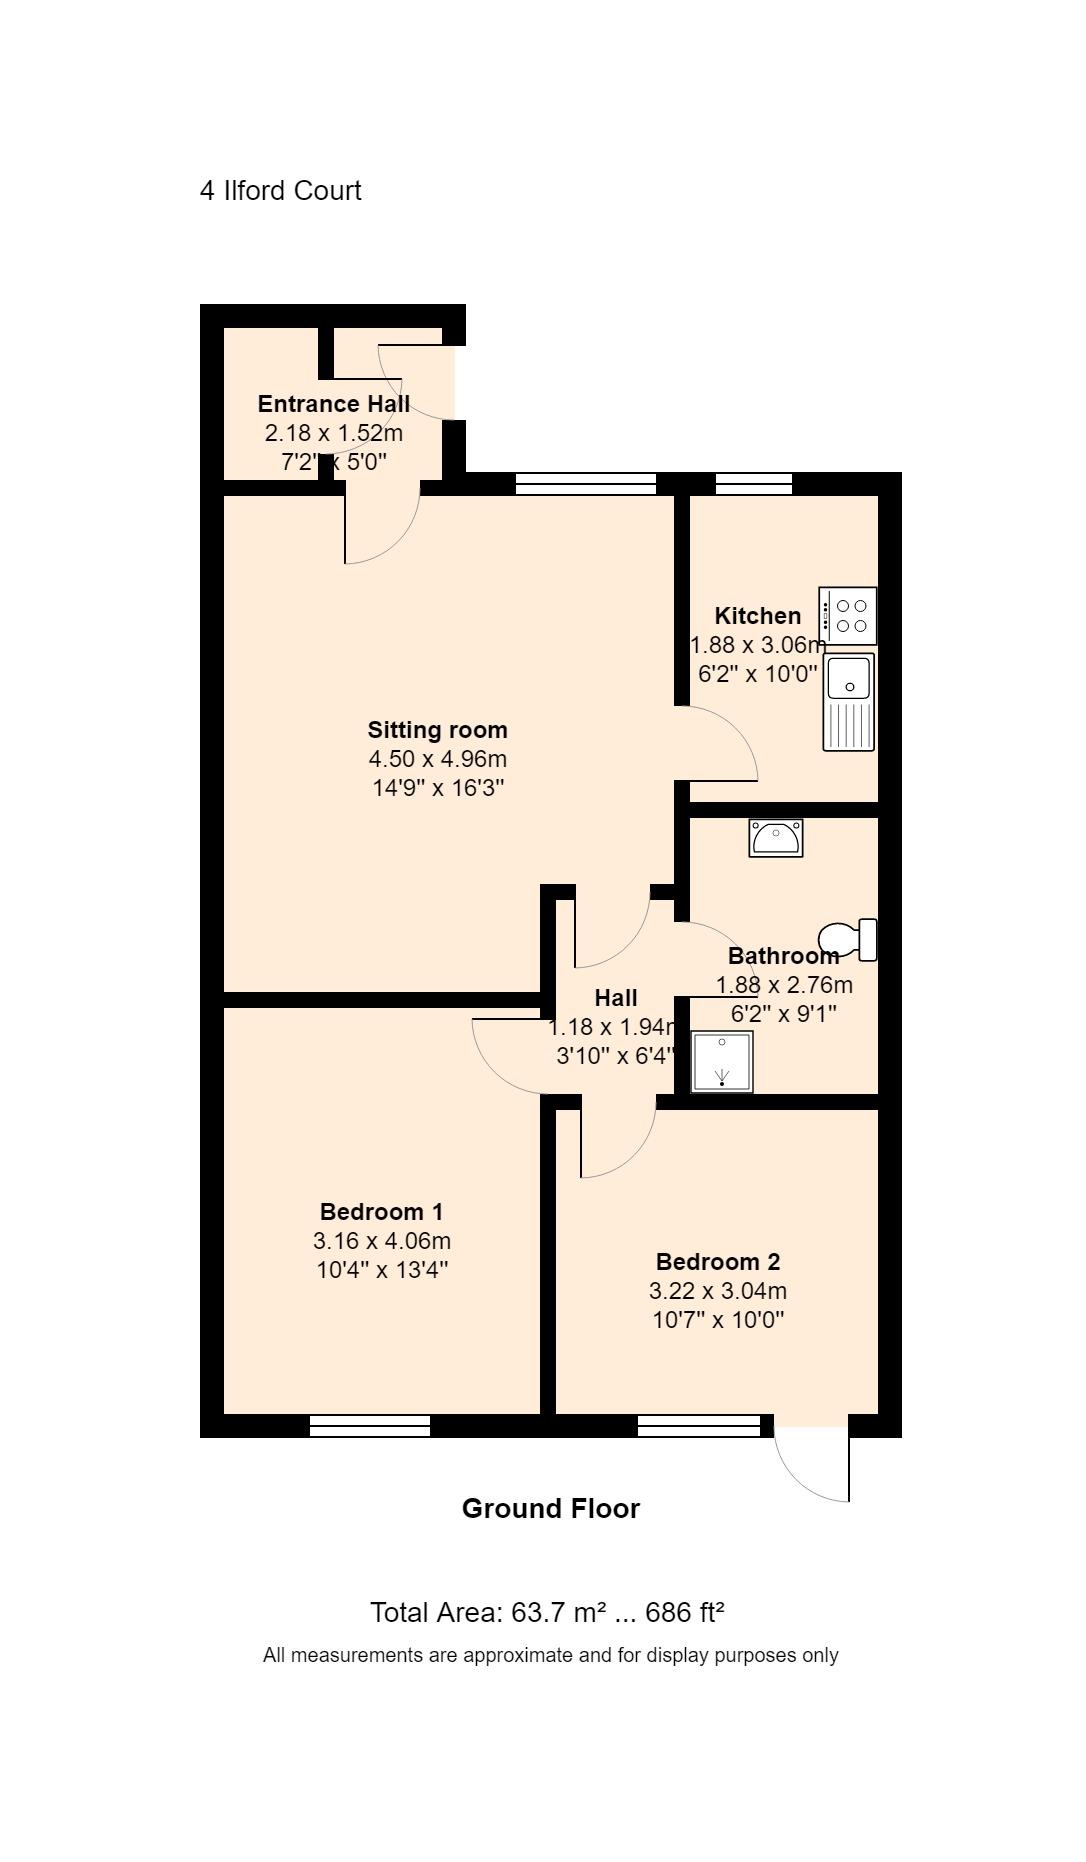 4 Ilford Court Floorplan